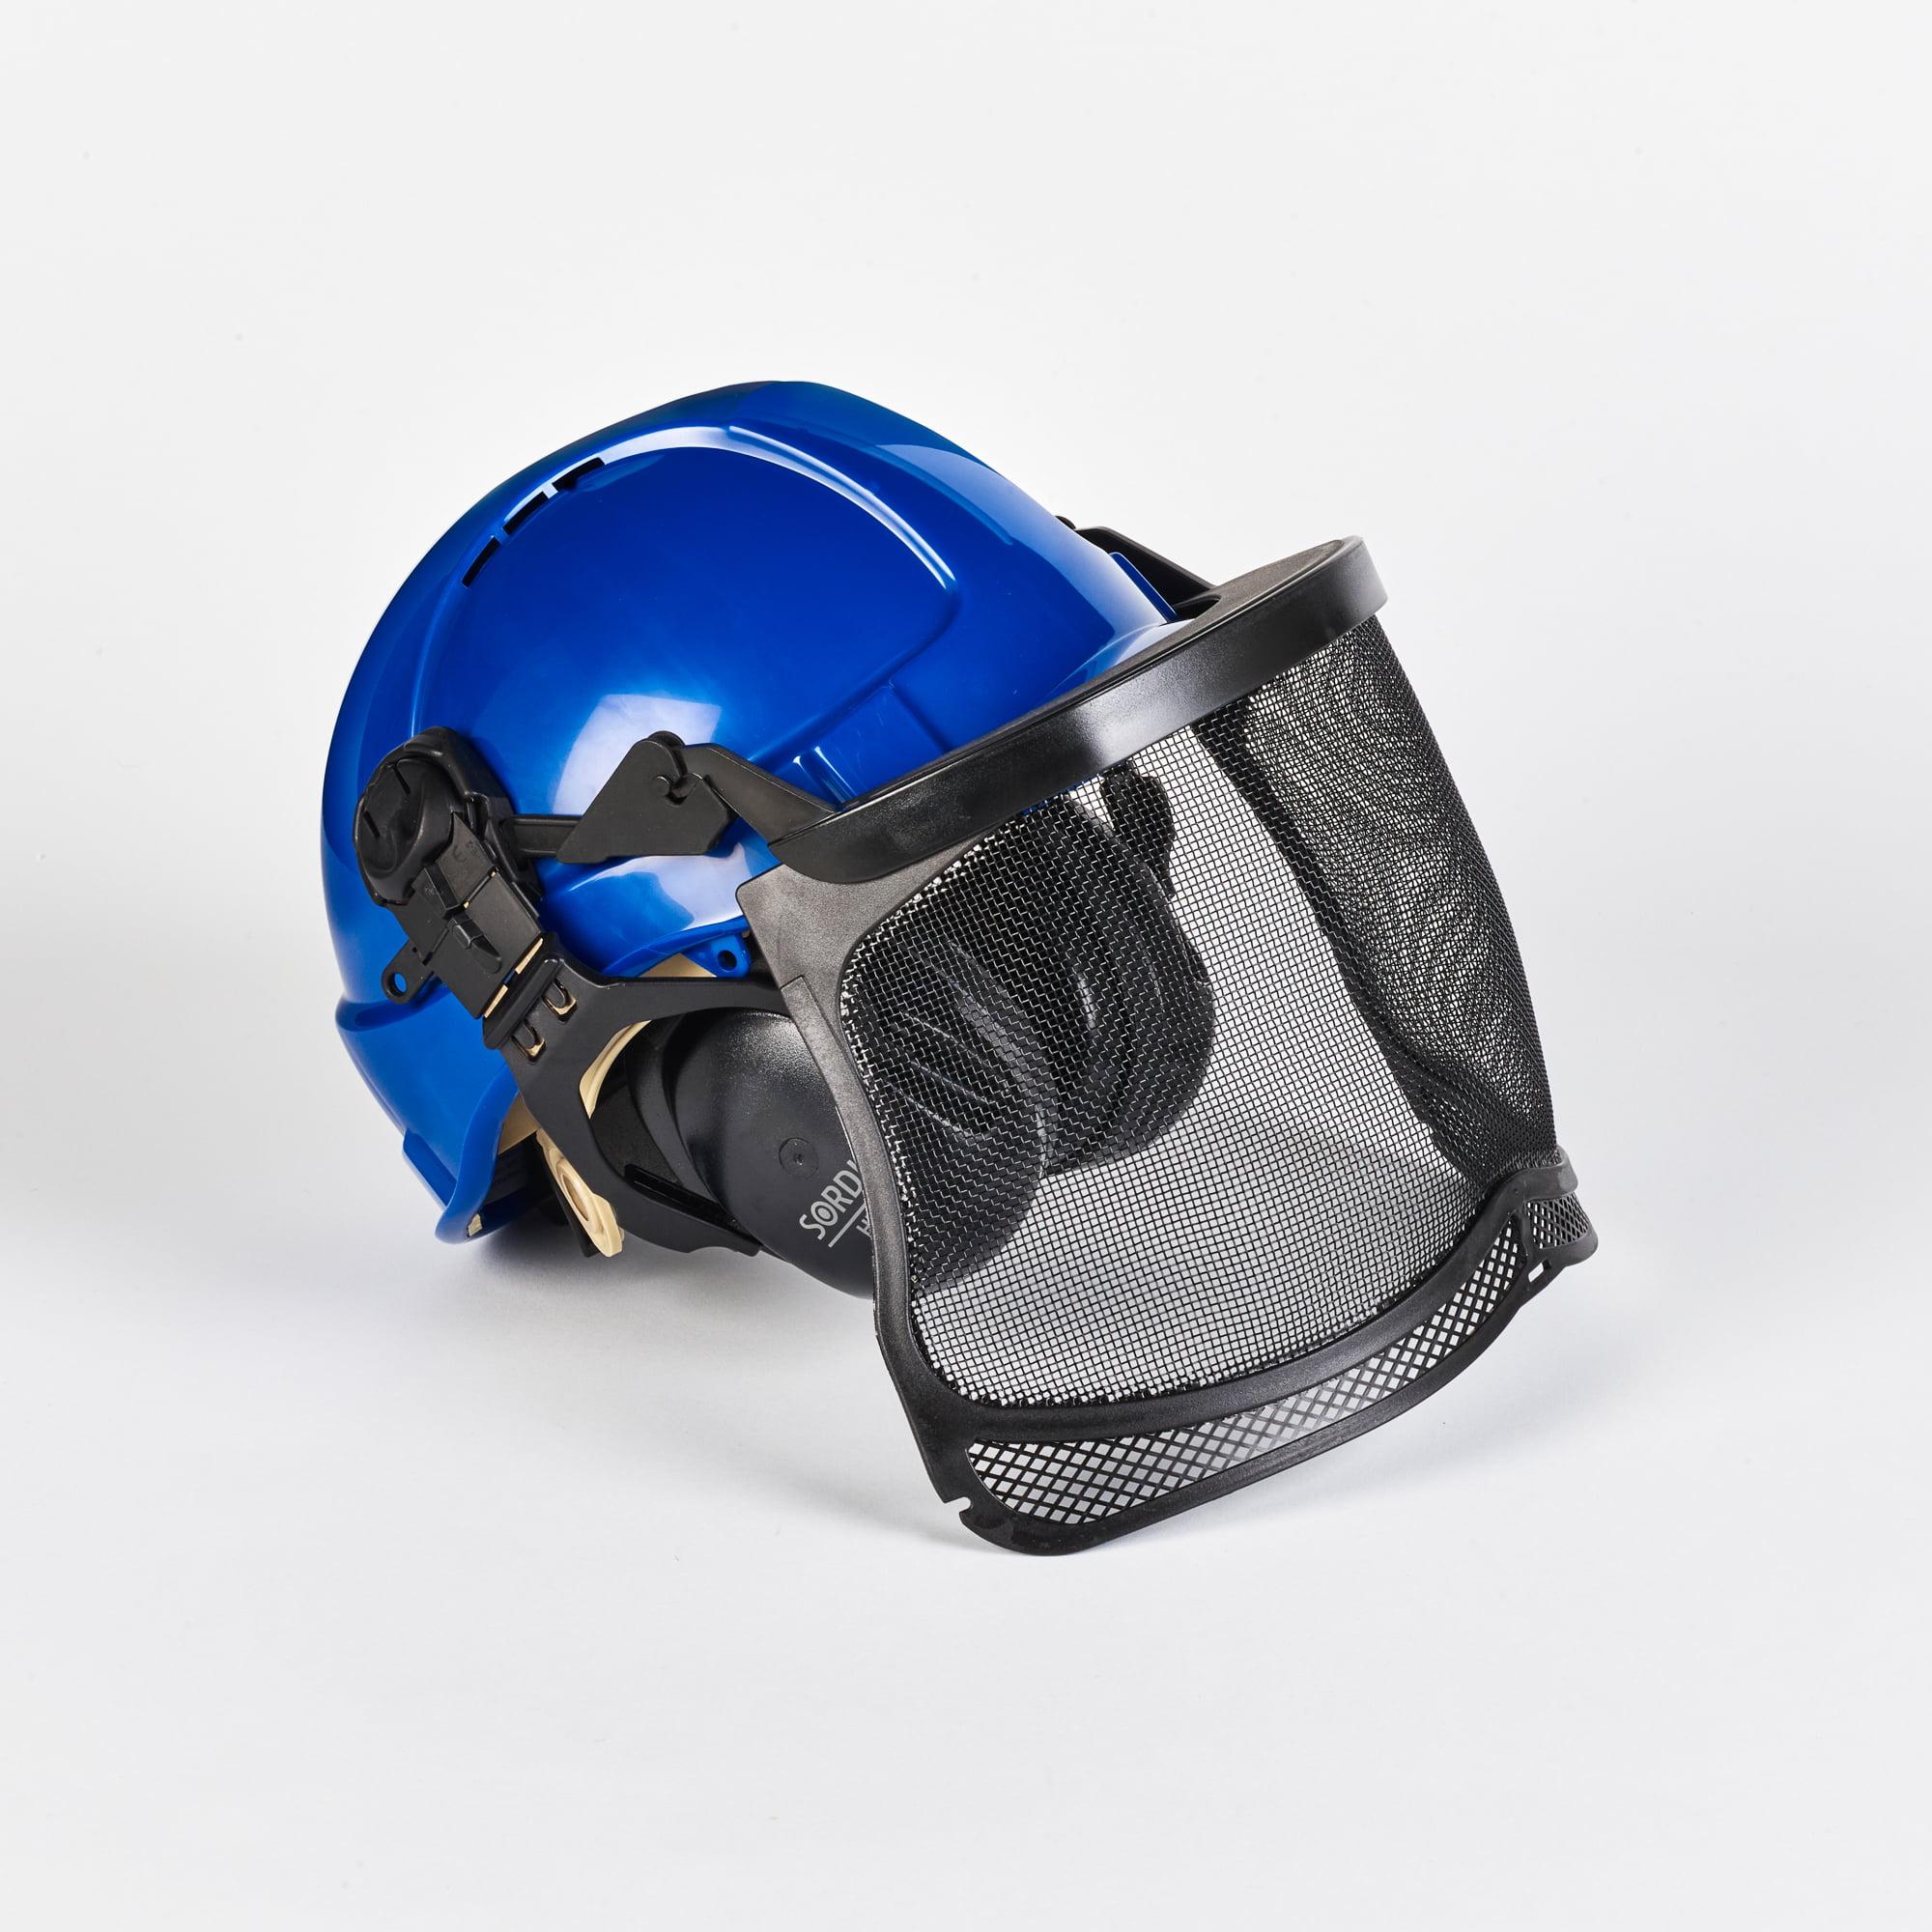 Base Tech Forestry Ground Helmet SNR 31dB (Blue)